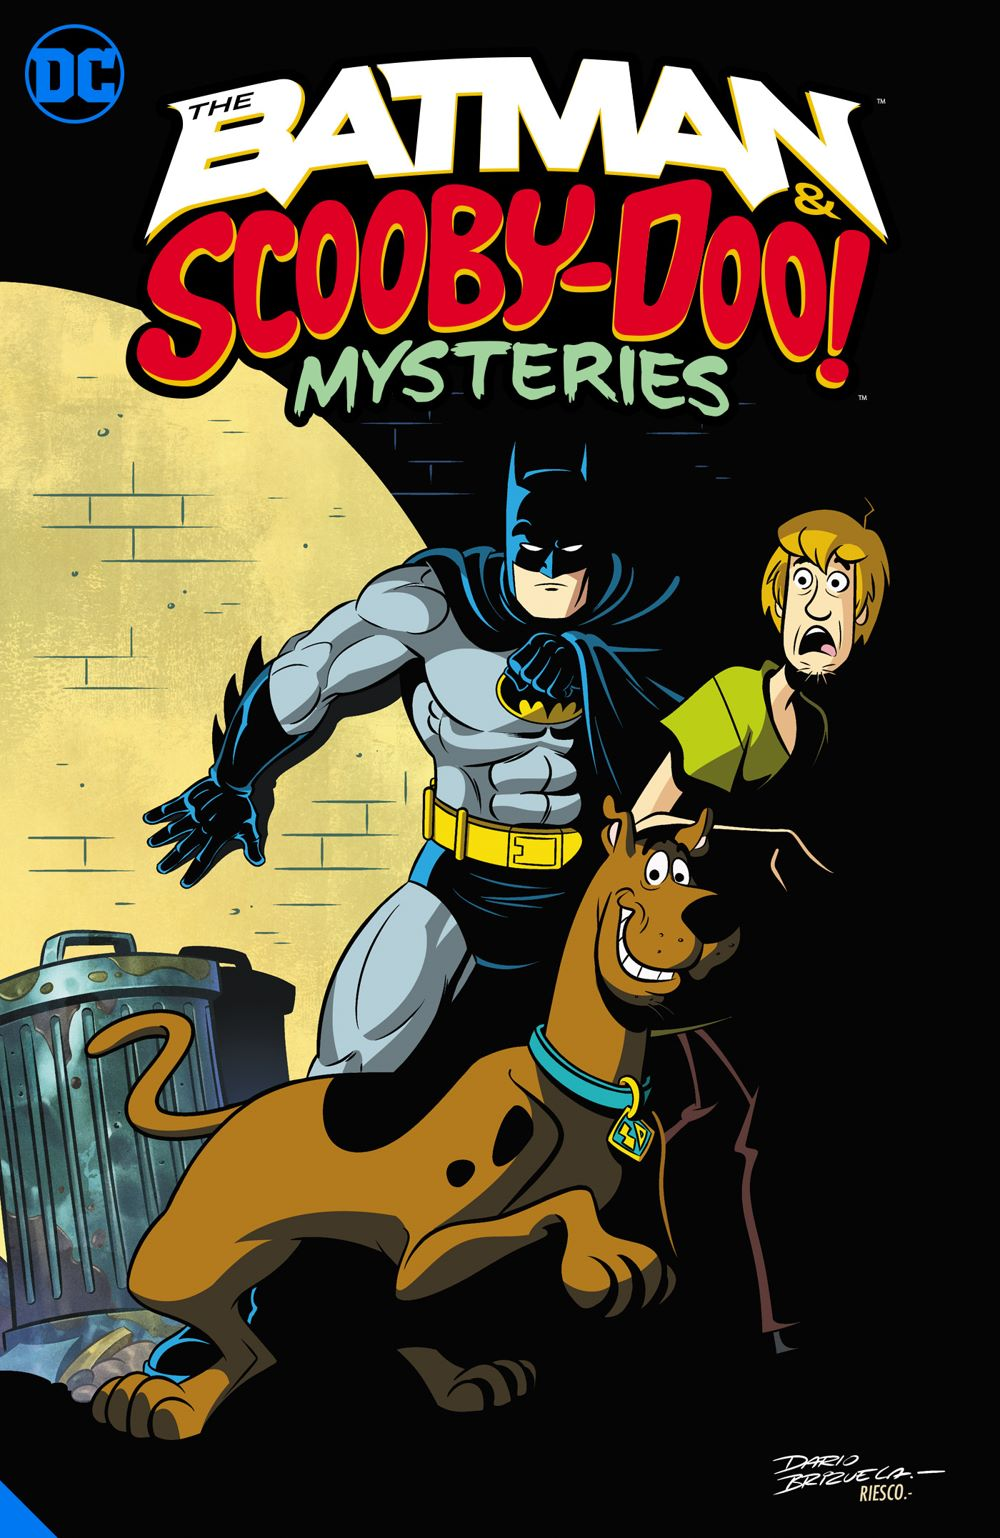 thebatmanscoobydoomysteries_adv DC Comics August 2021 Solicitations